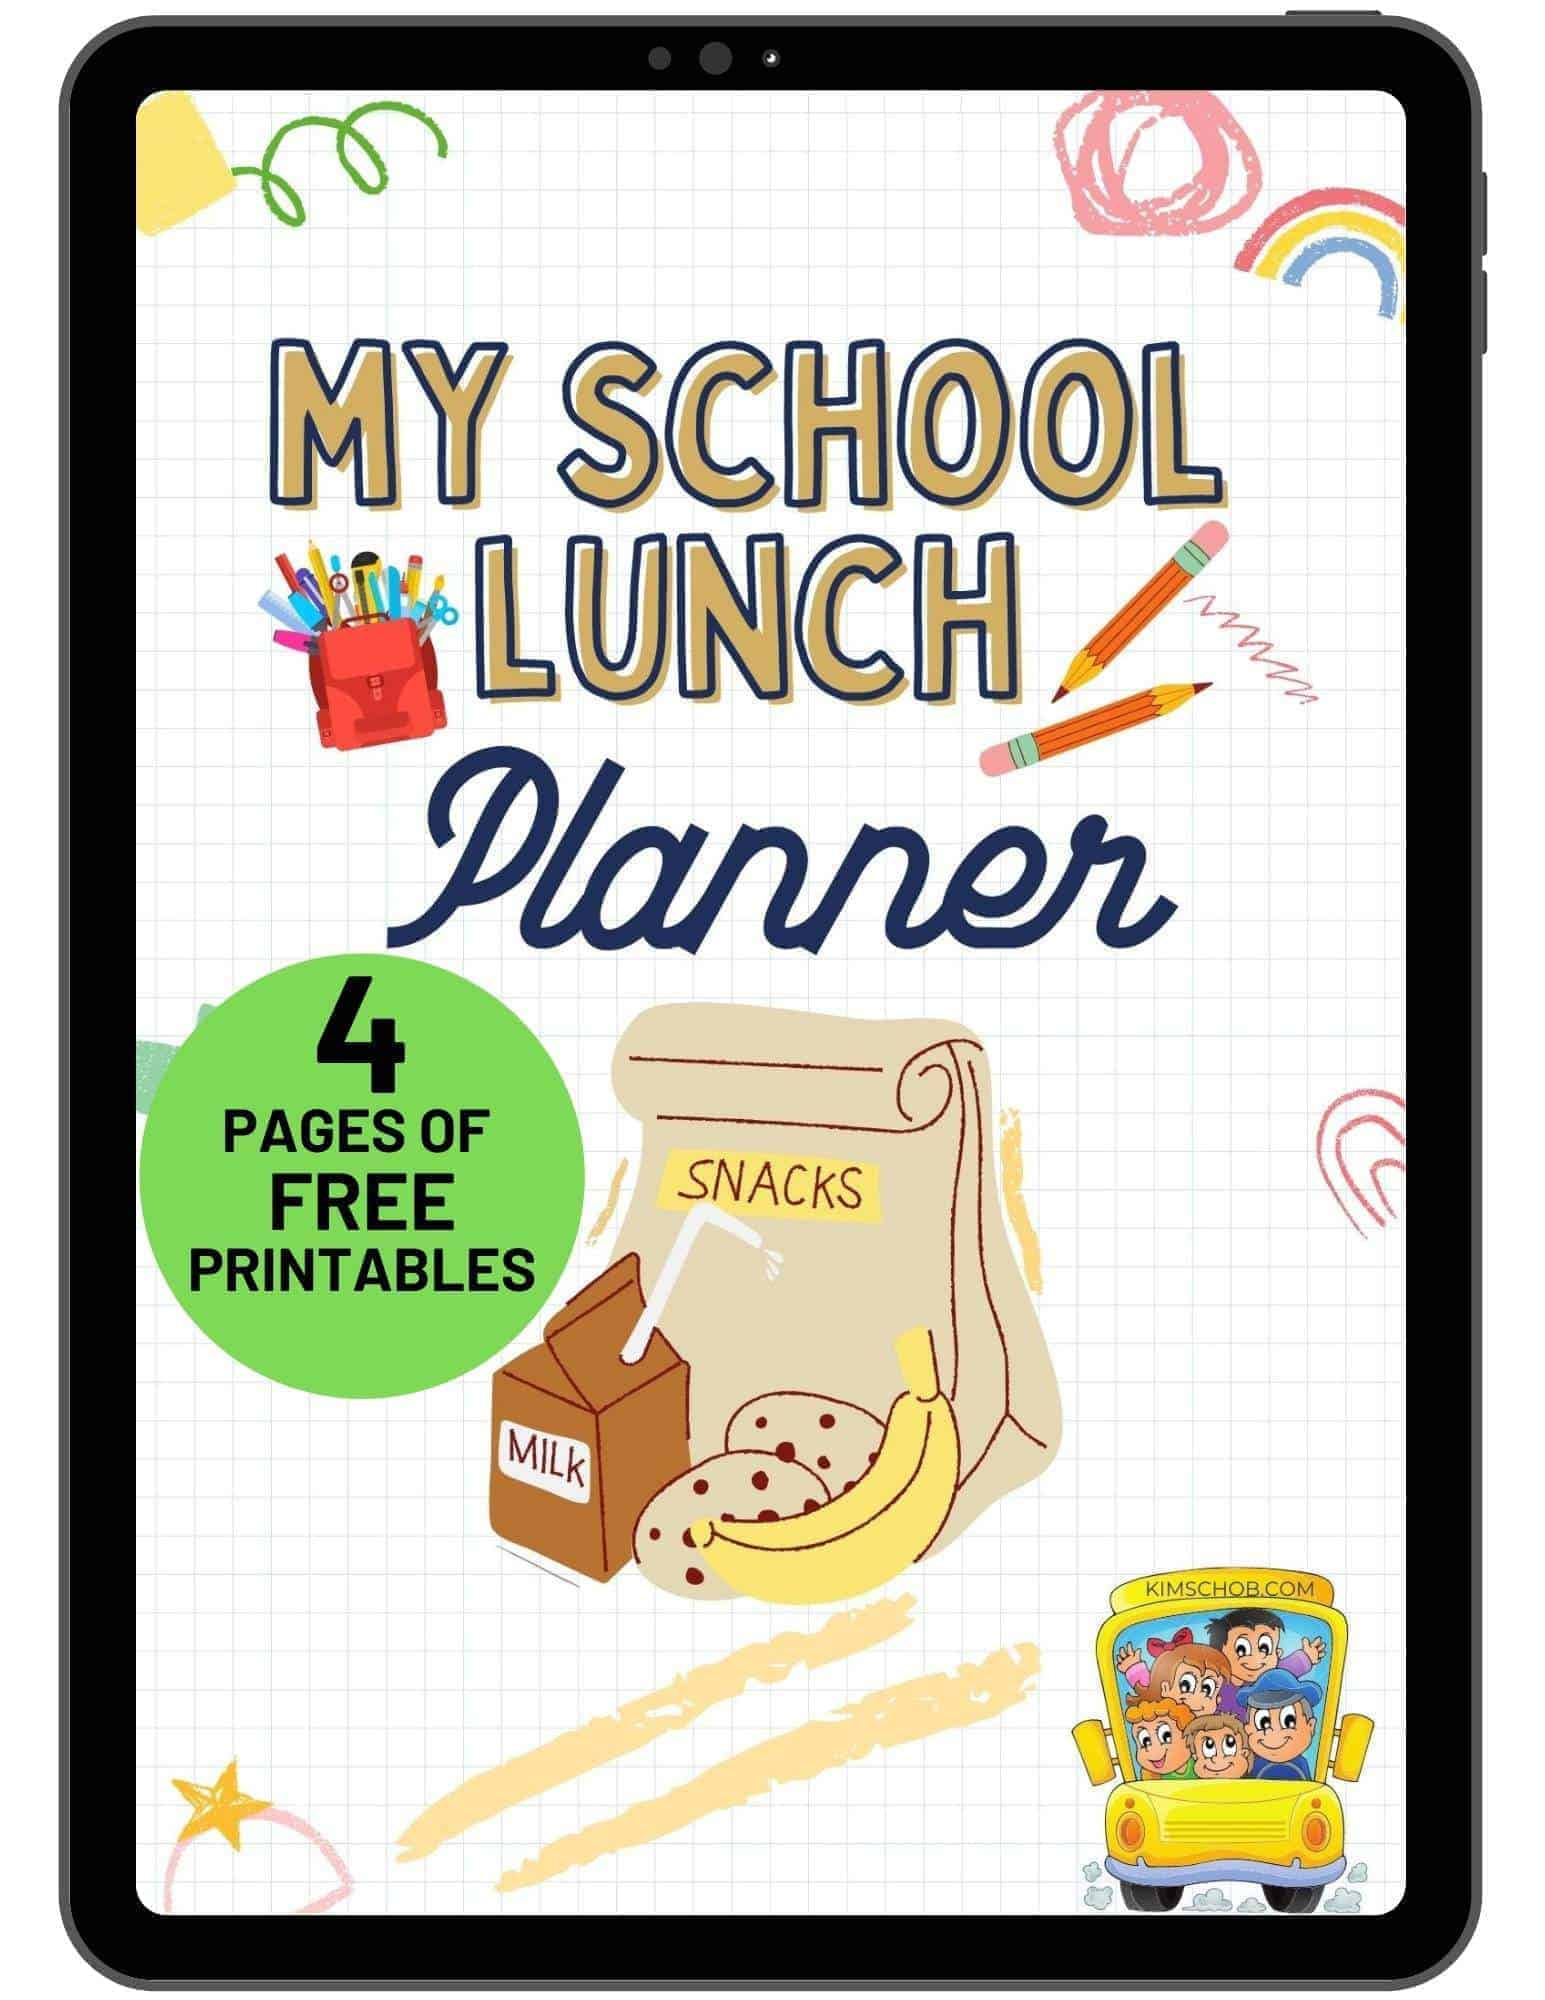 11-School-Lunch-Ideas-Your-Kids-Will-Love | kimschob.com